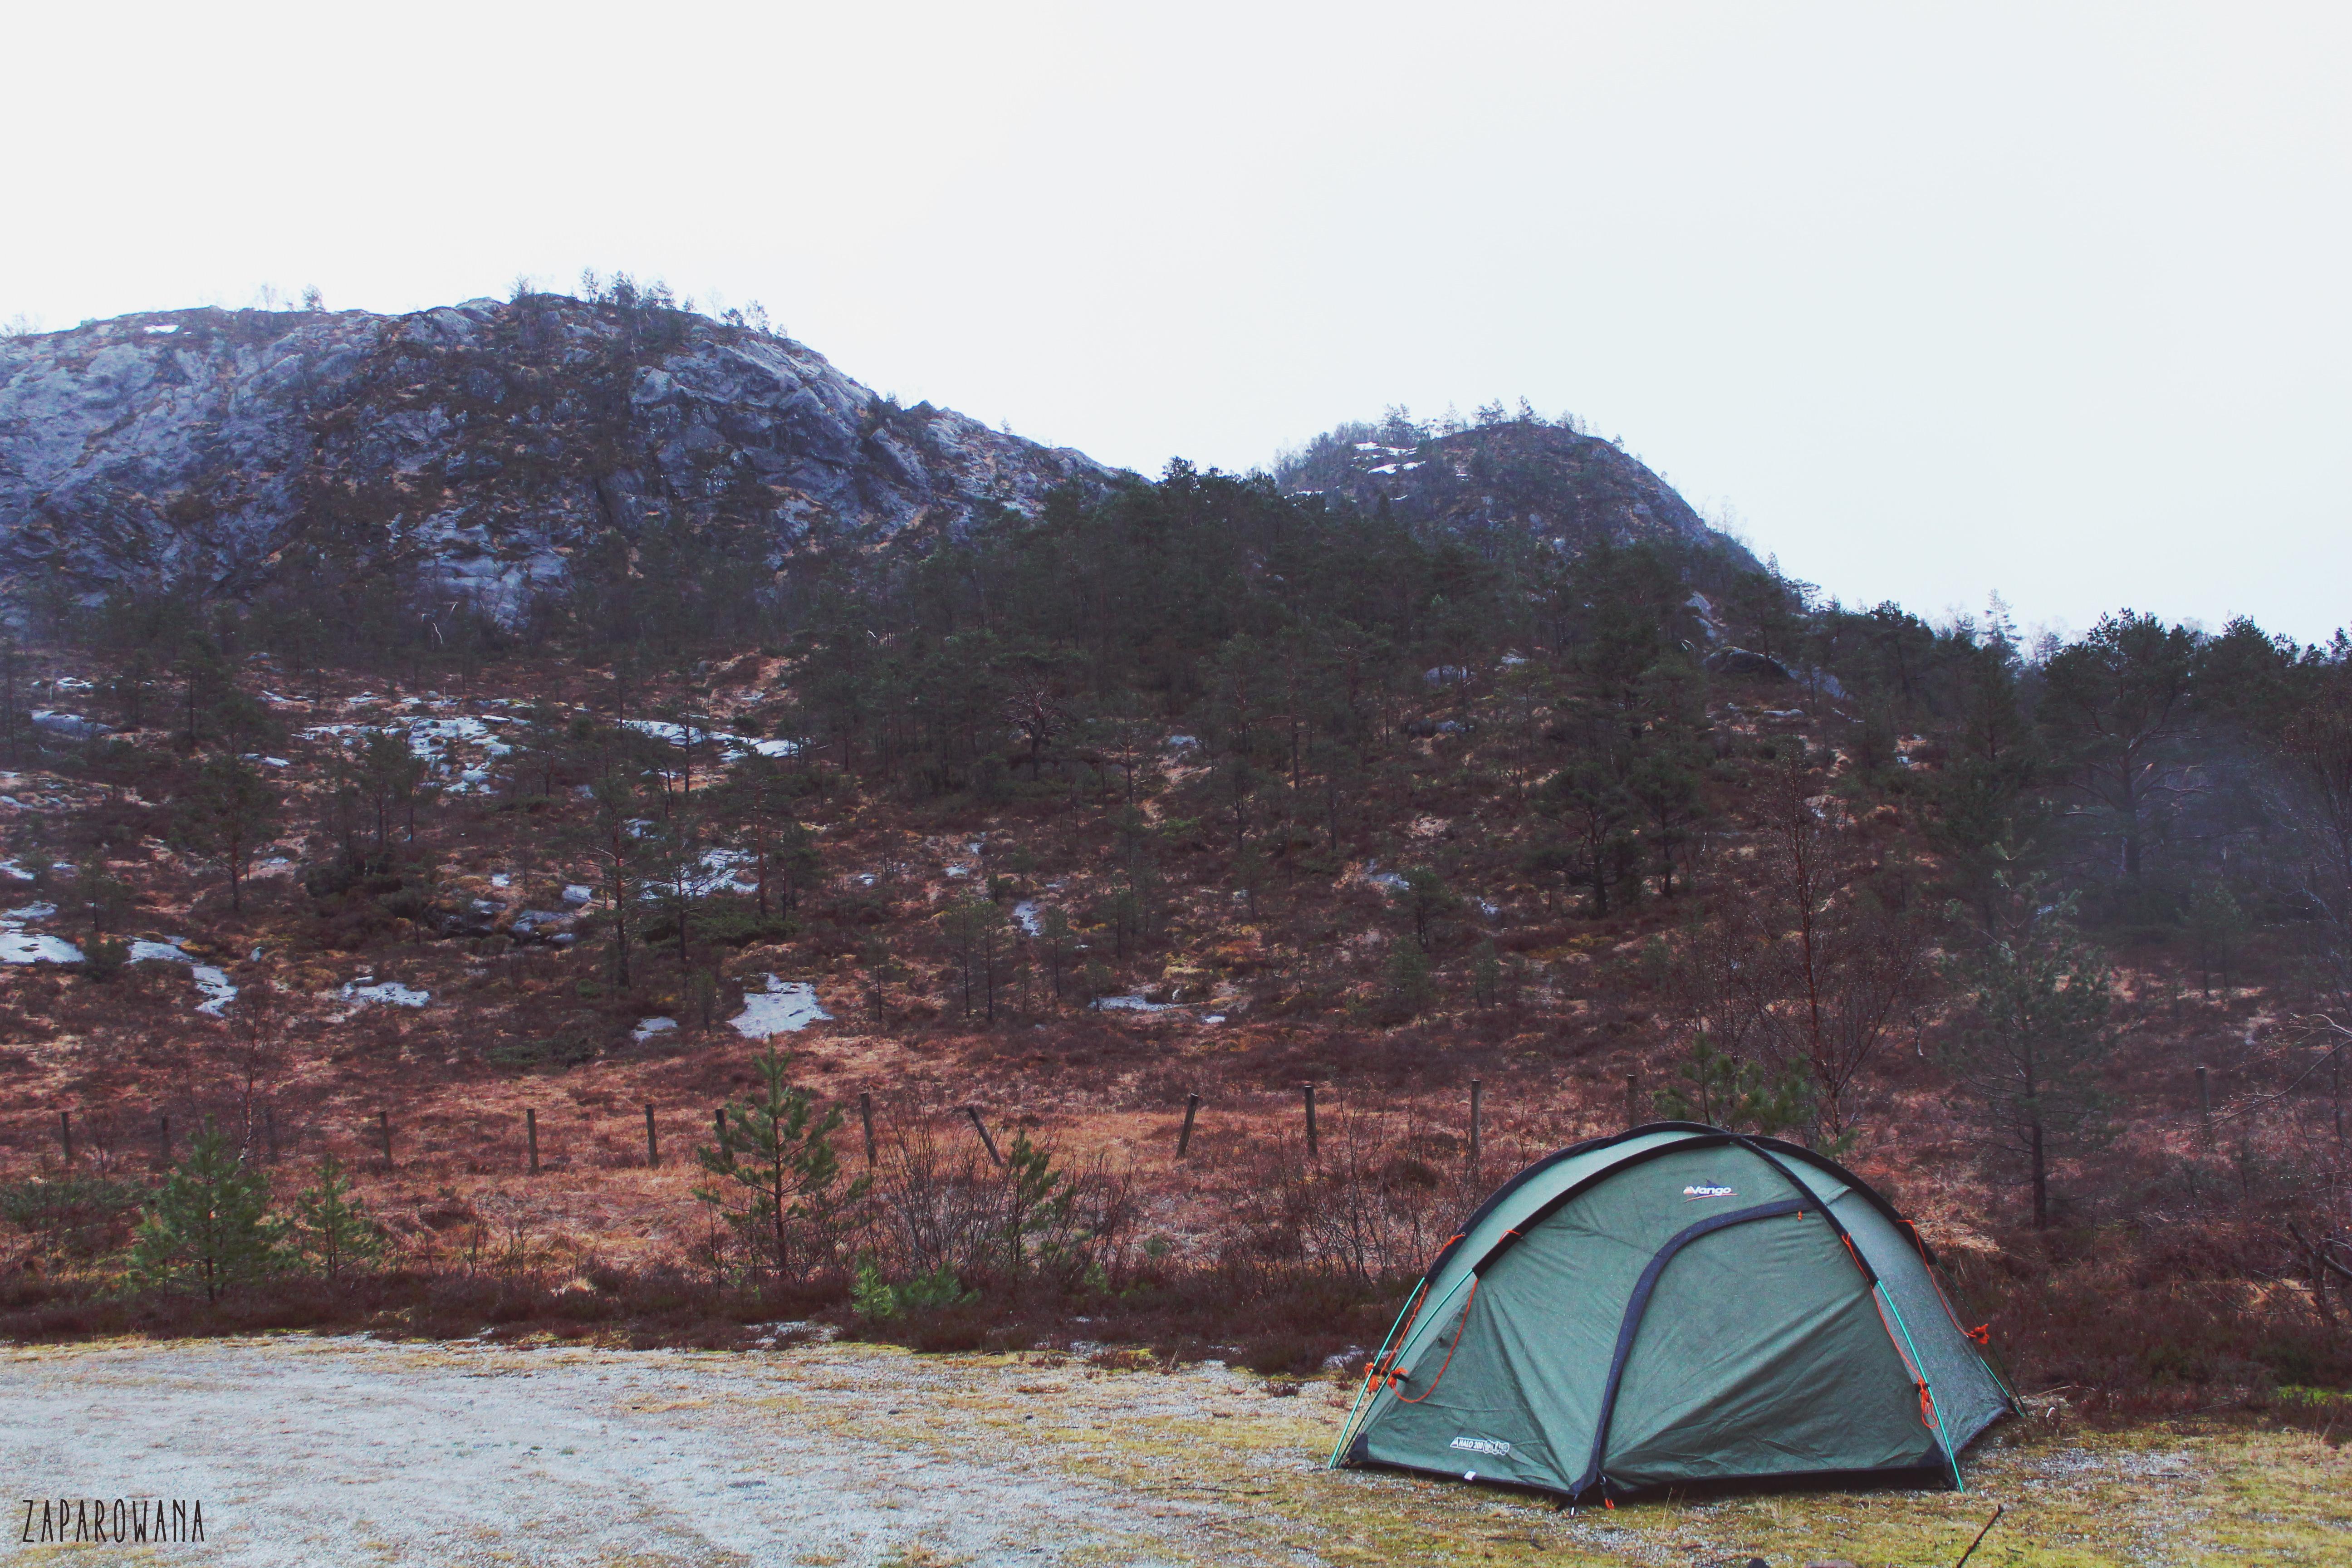 ZAPAROWANA - CAMPING - NORWAY